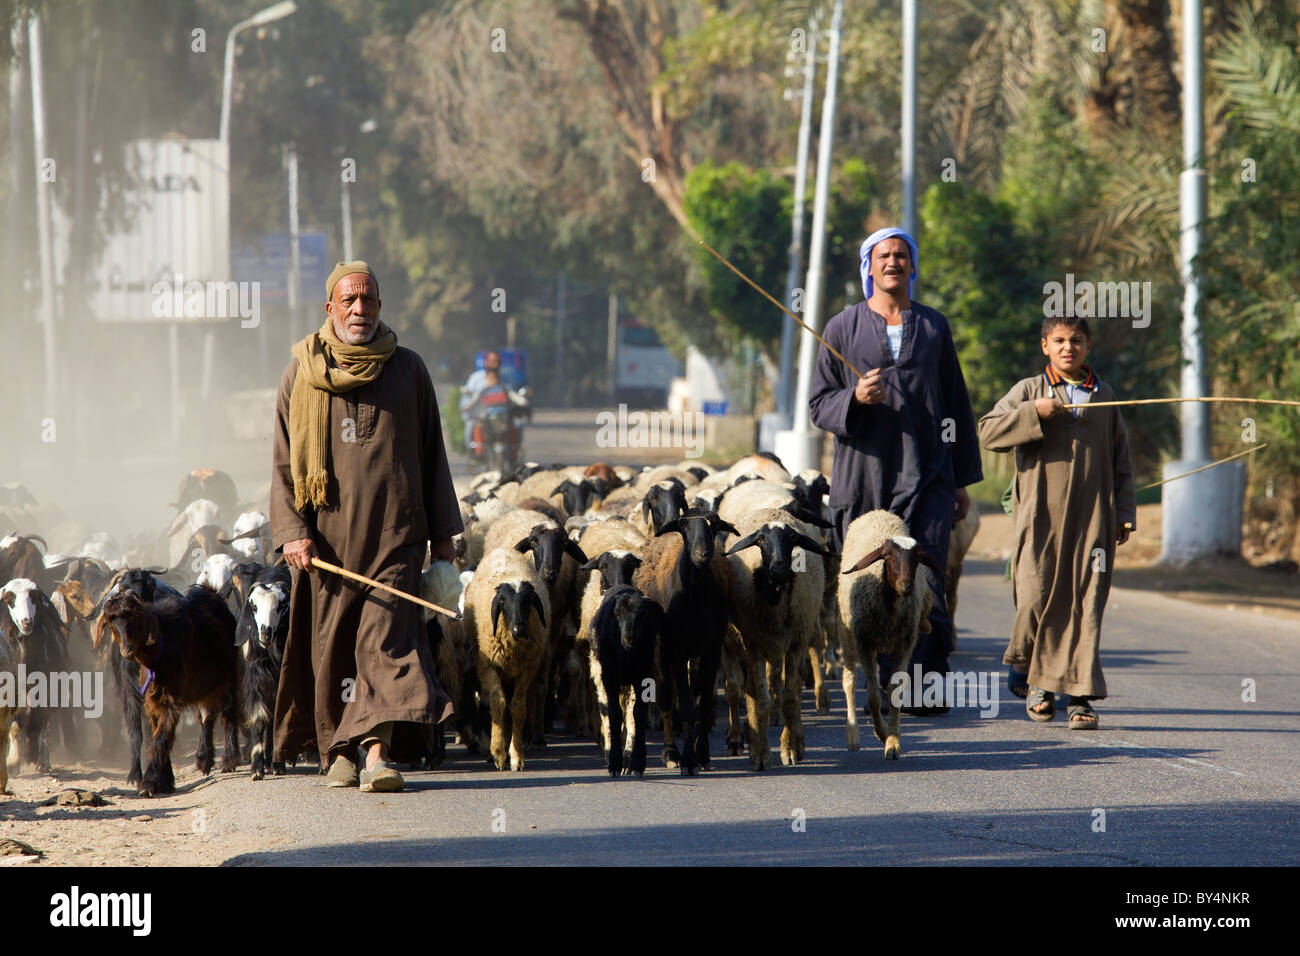 Goatherds near Saqqara, Egypt 2 - Stock Image